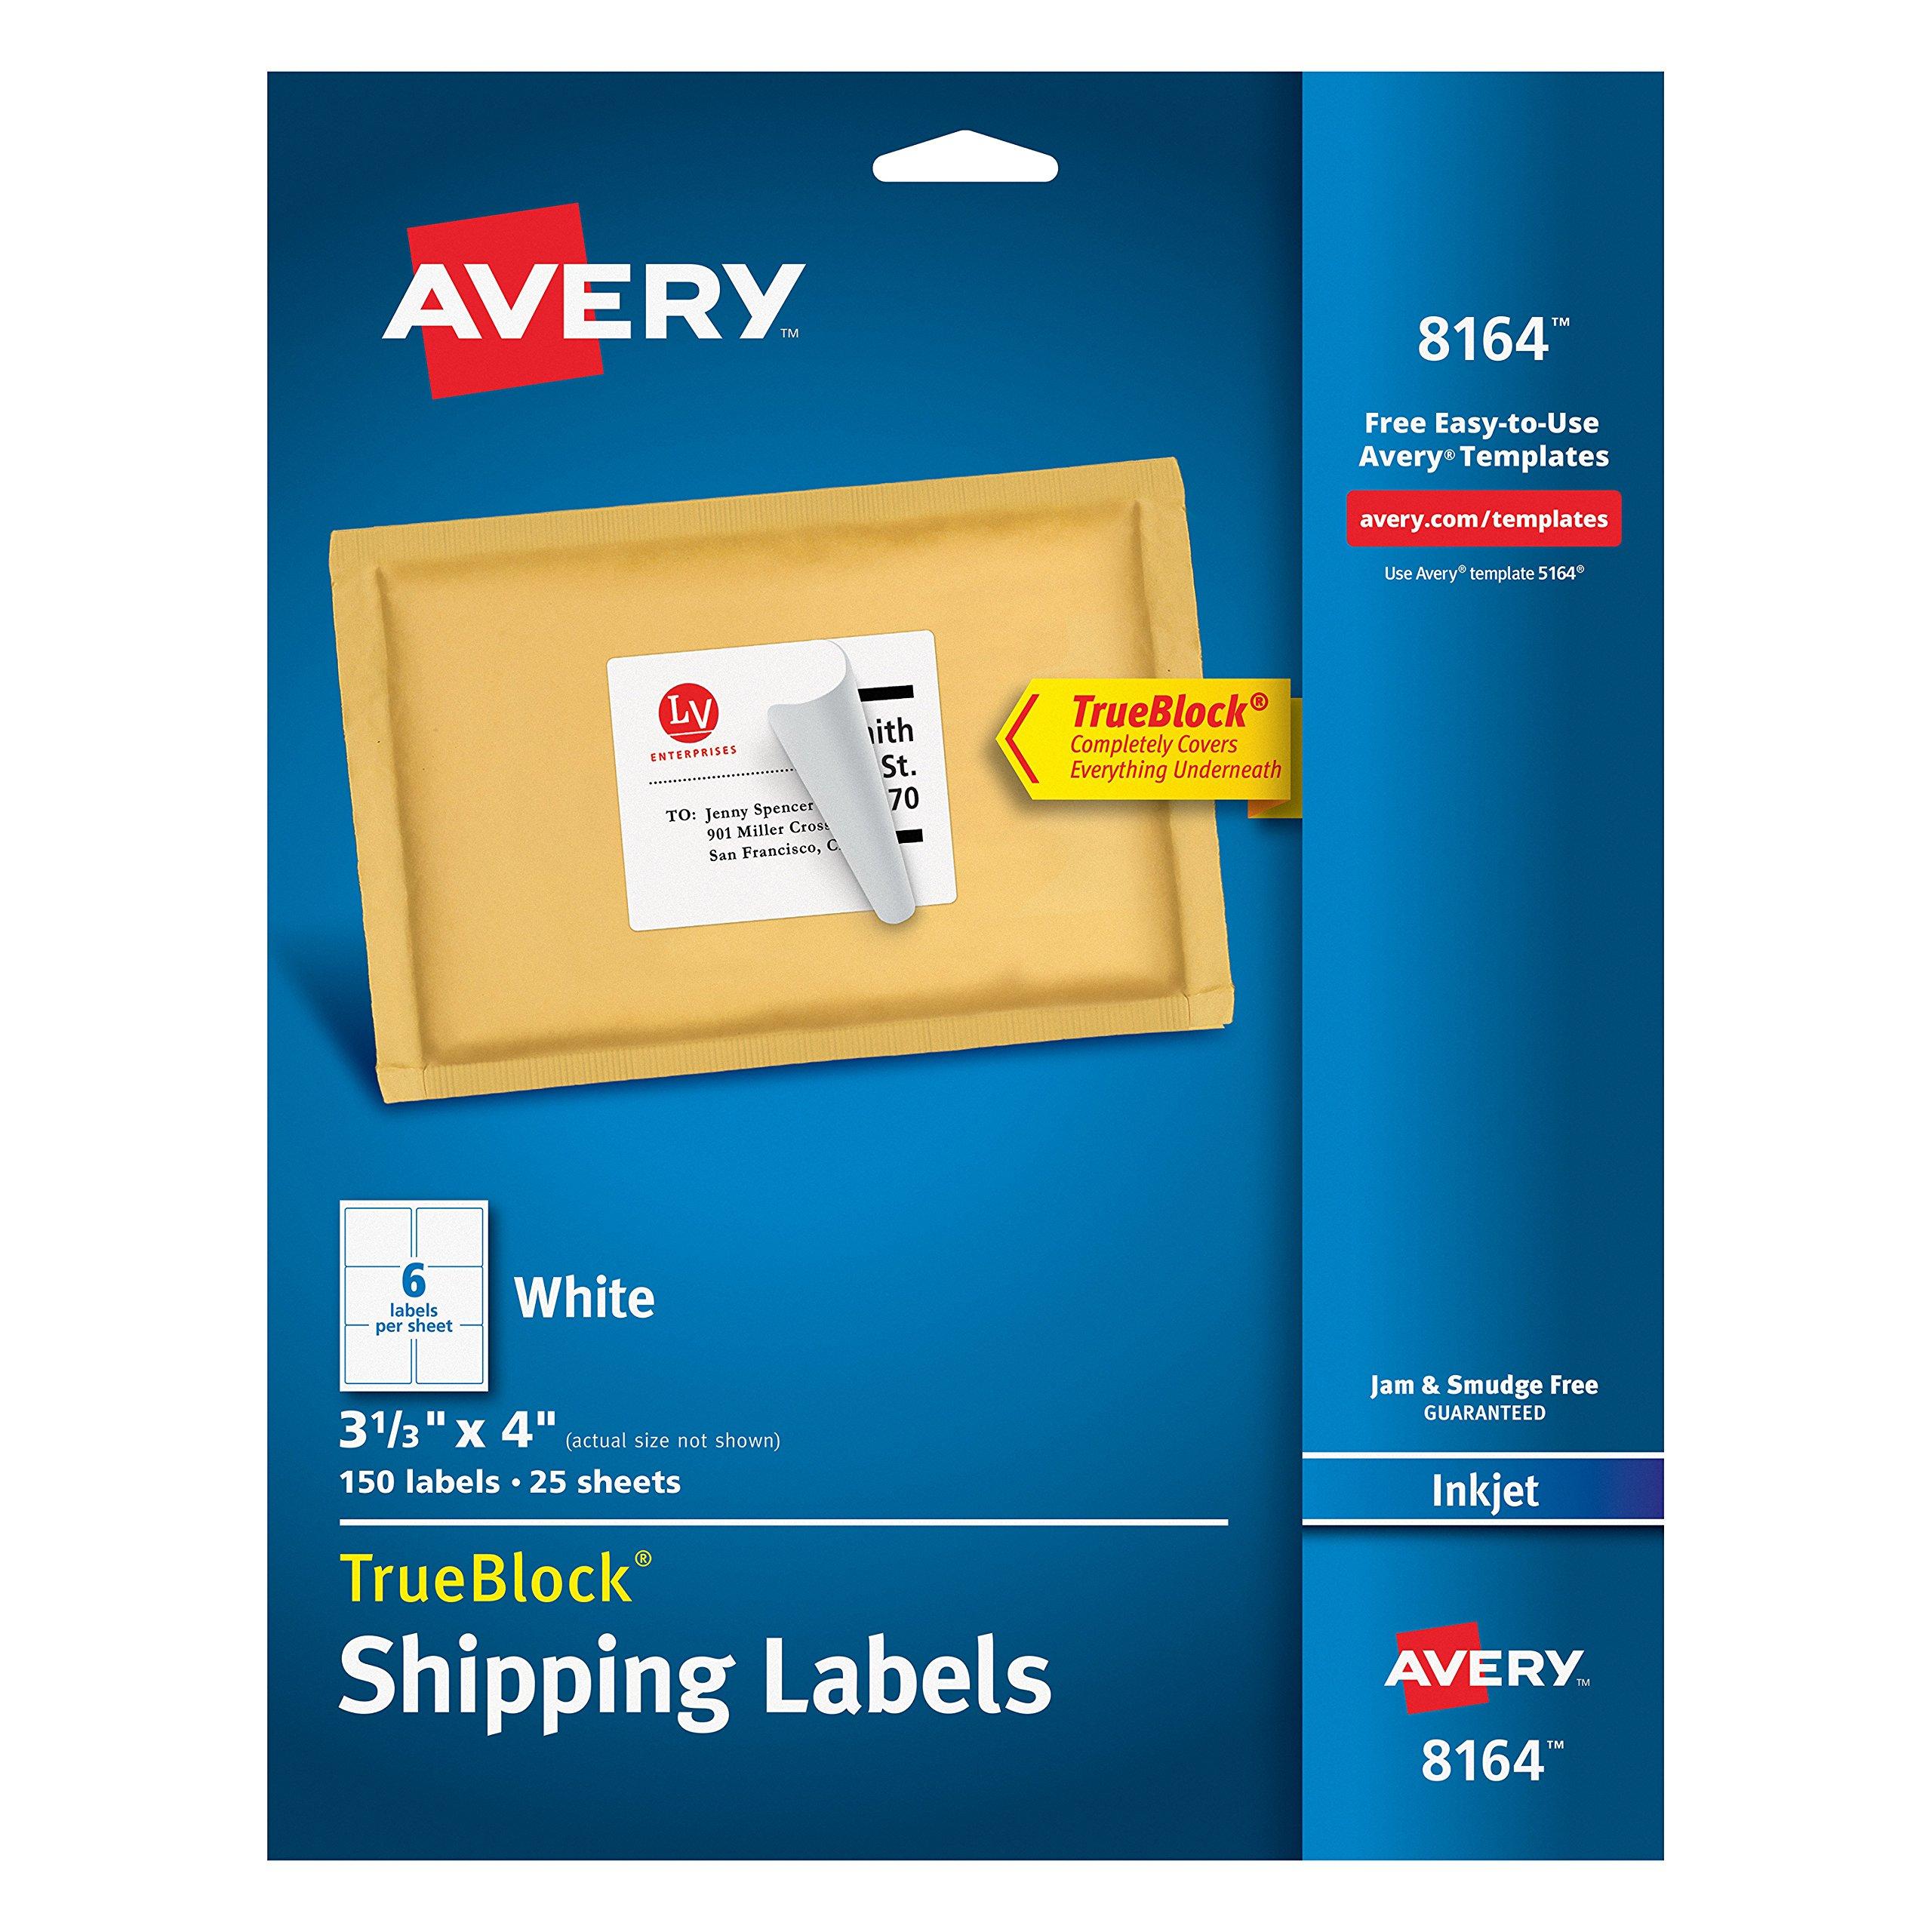 Avery Shipping Address Labels, Inkjet Printers, 150 Labels, 3-1/3x4 Labels, Permanent Adhesive, TrueBlock (8164)